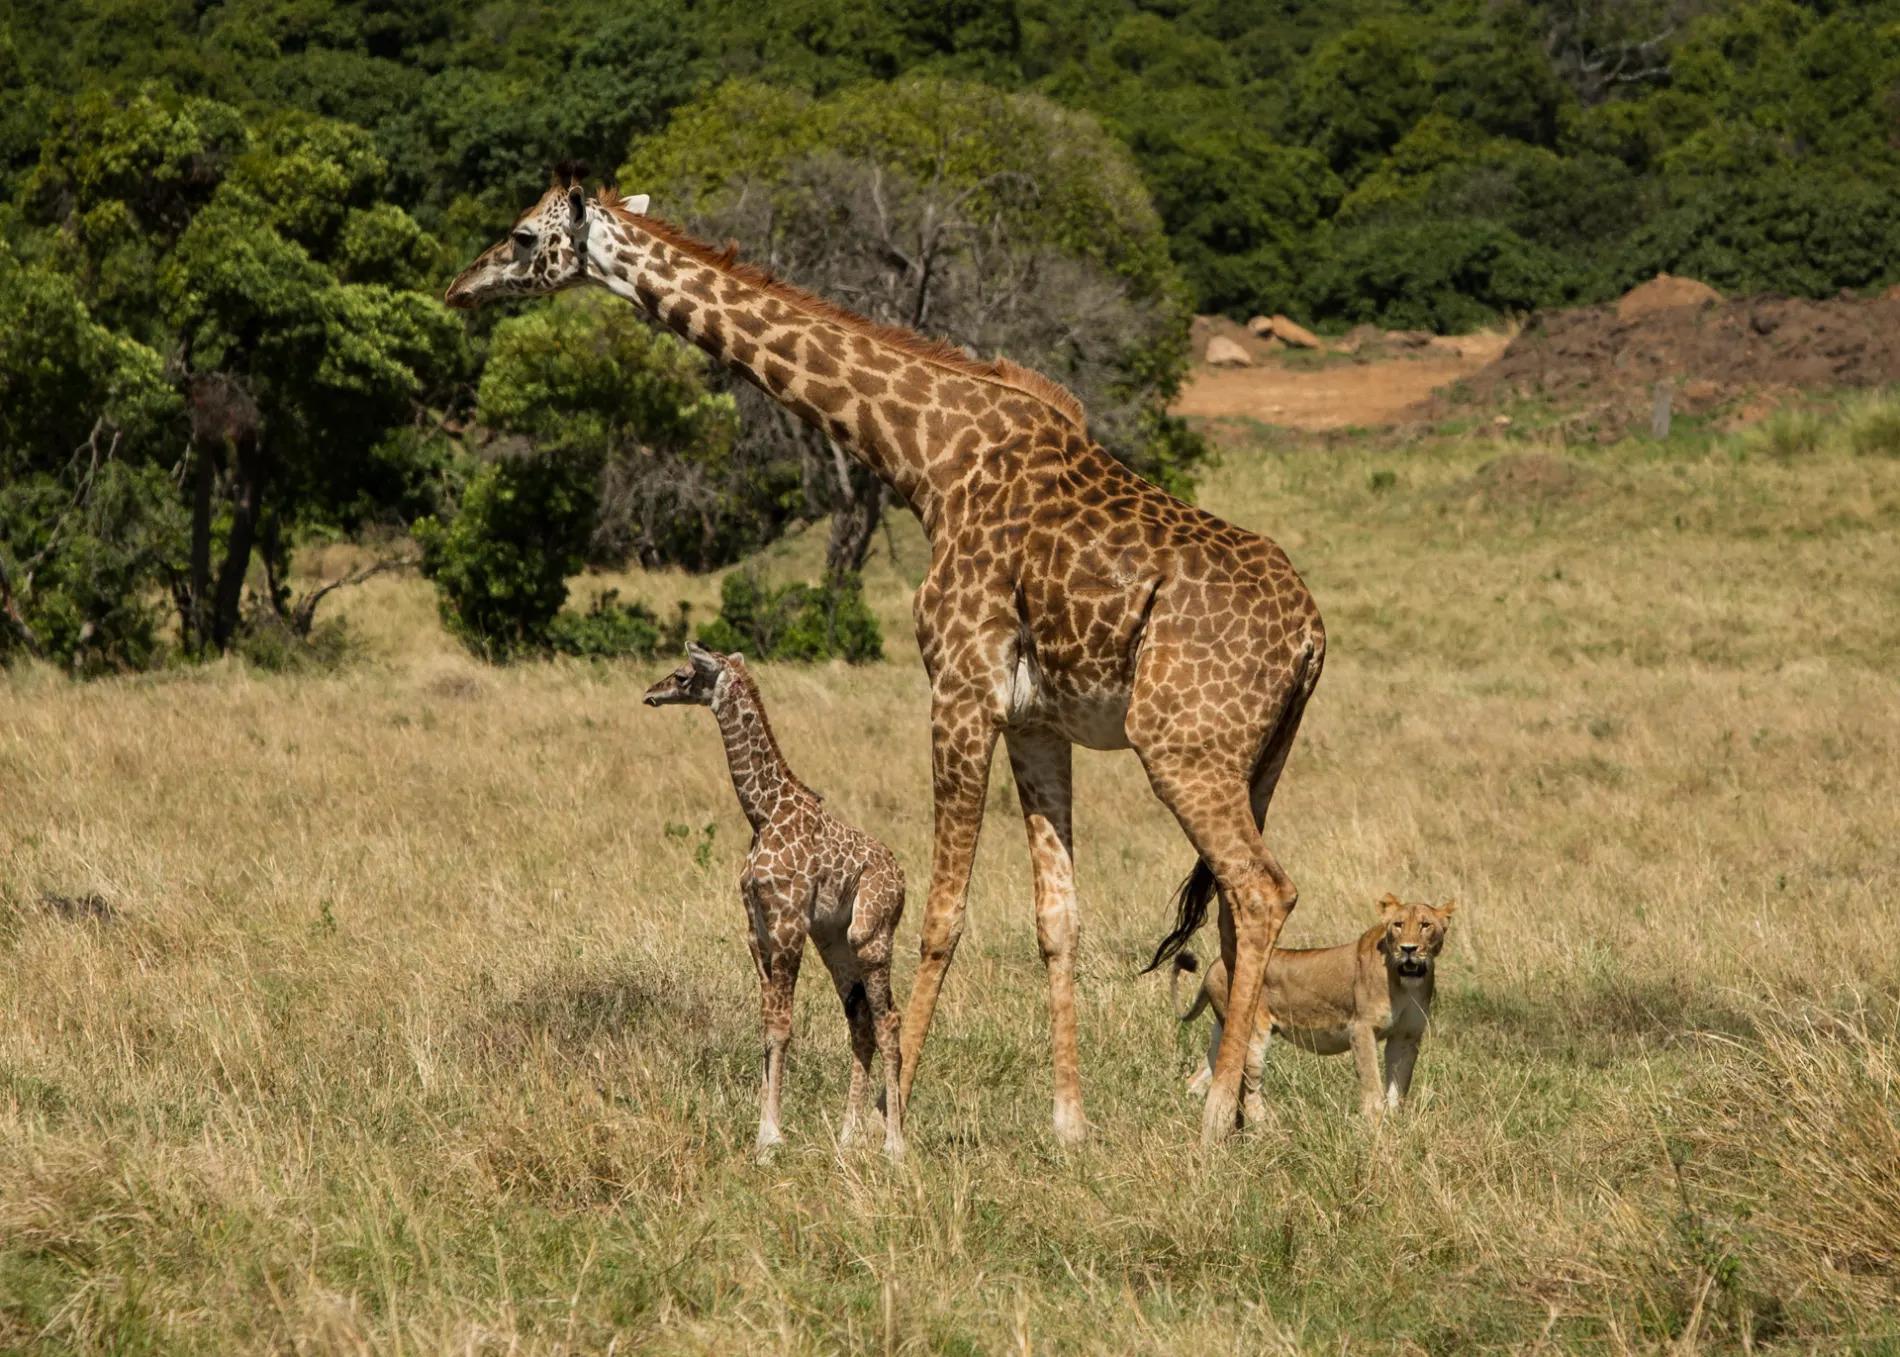 Lioness and giraffe